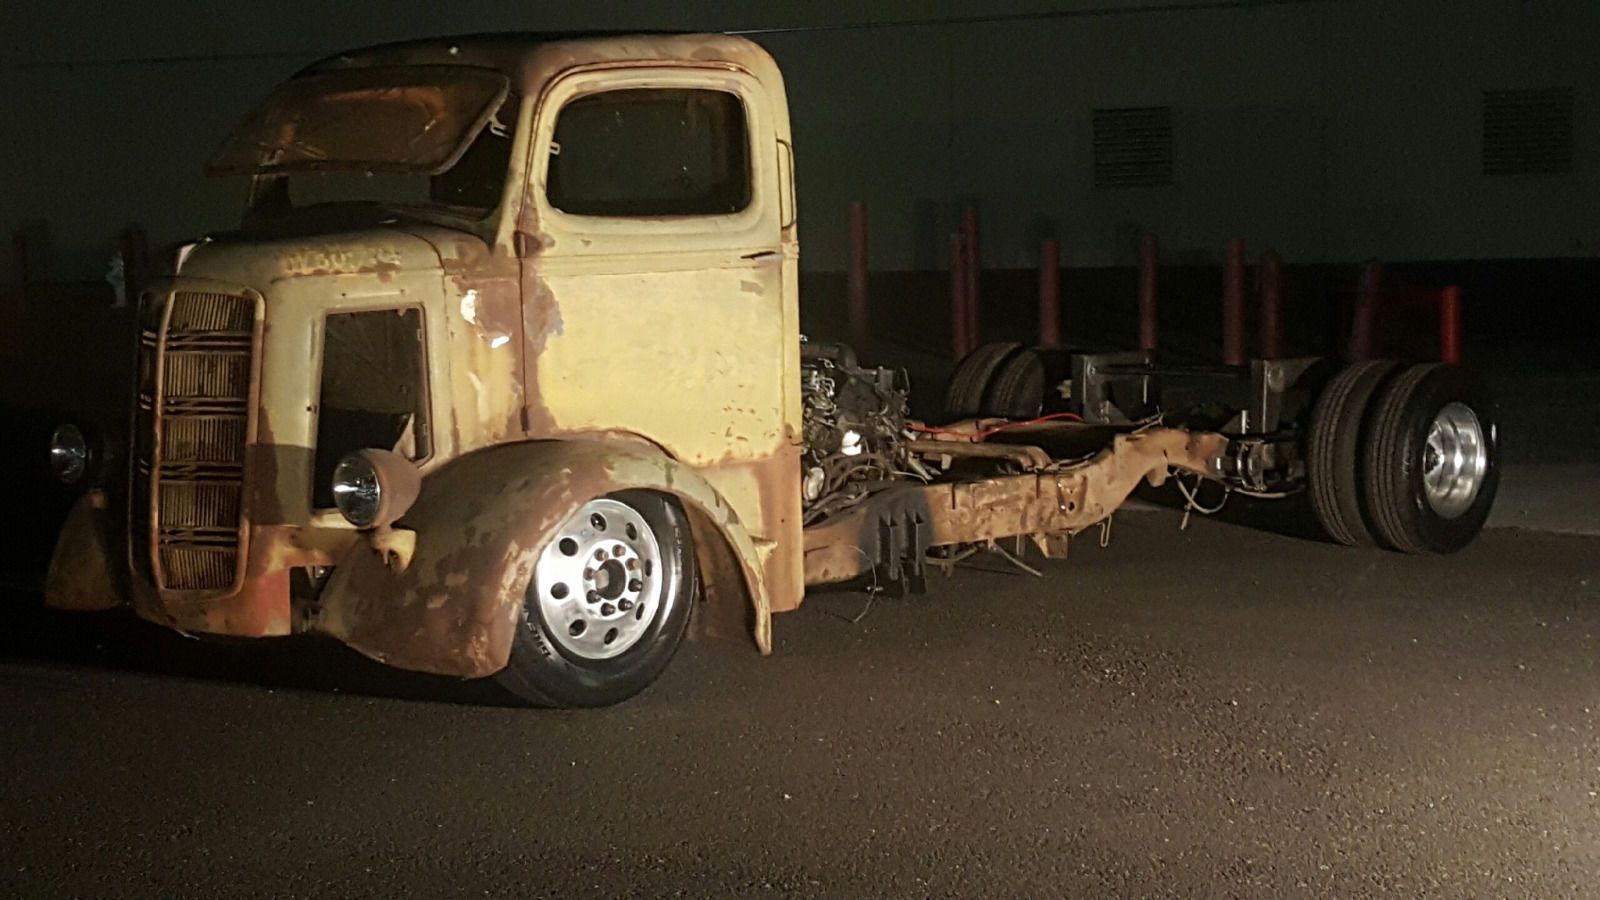 1940 Mack Coe W Dodge Running Gear Ebay Motors Cars Amp Trucks Other Makes Ebay Rodd